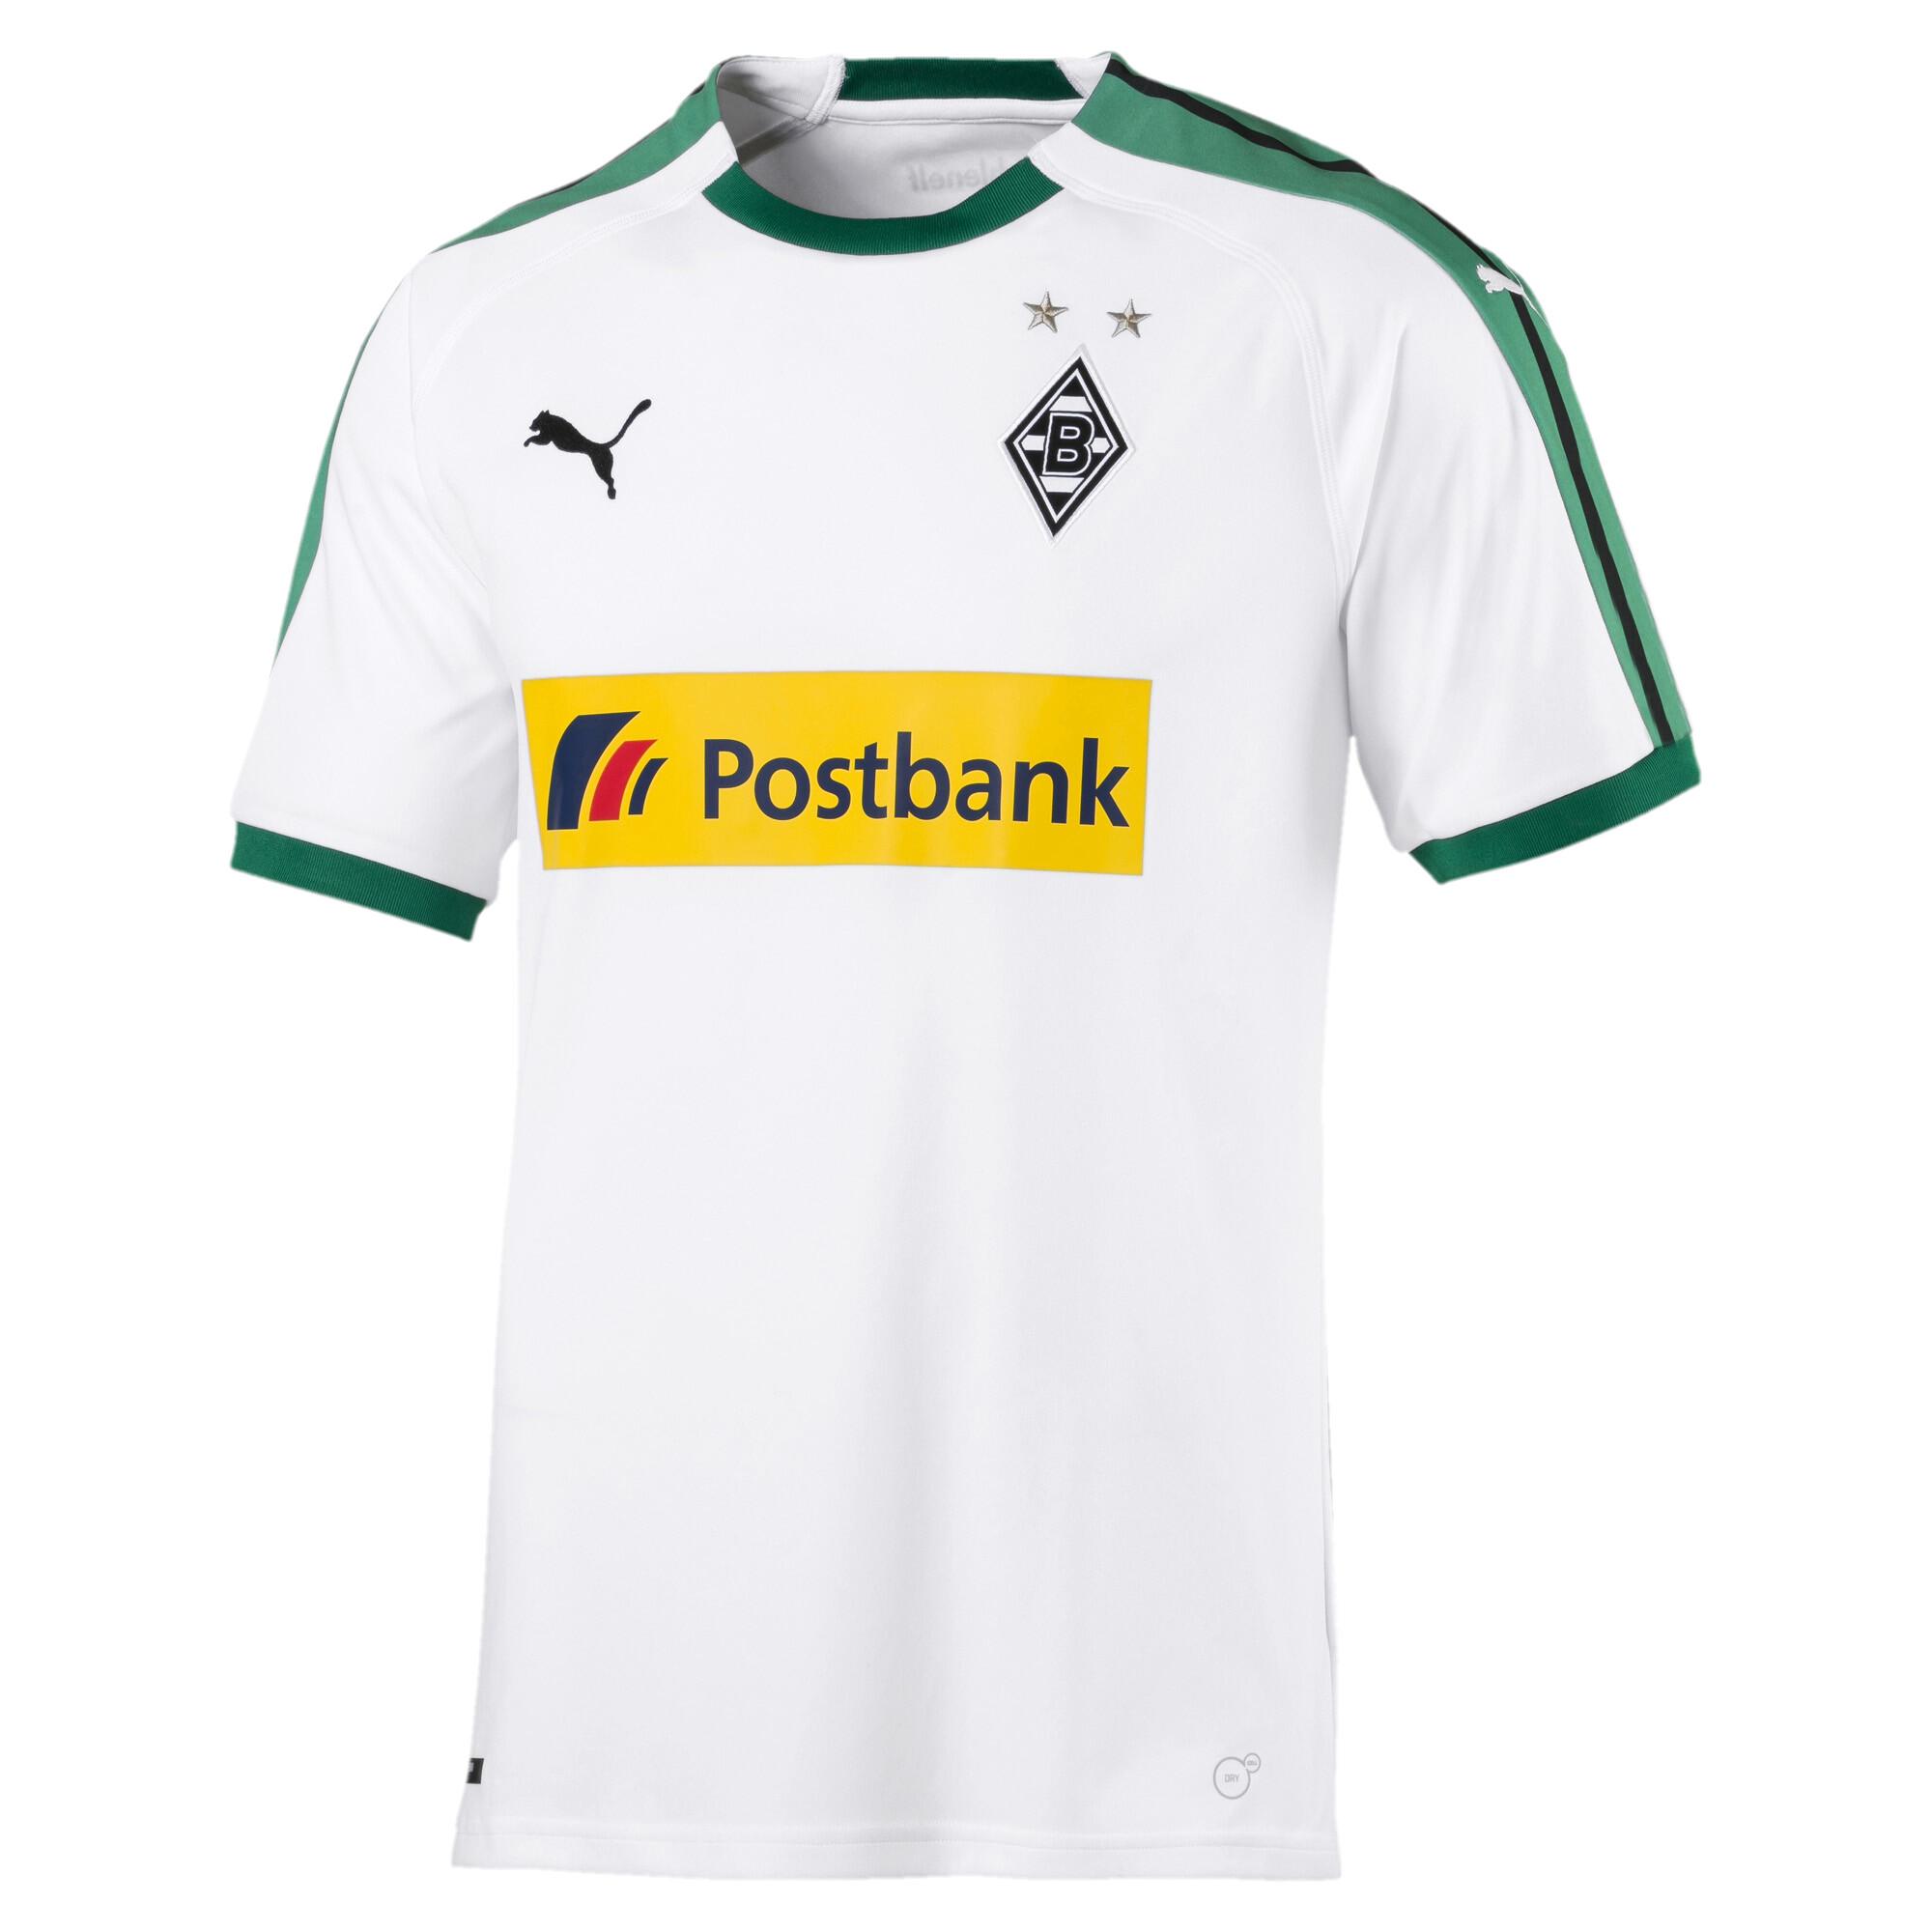 Indexbild 7 - PUMA Borussia Mönchengladbach Herren Replica Heimtrikot Männer Fußballtrikot Neu